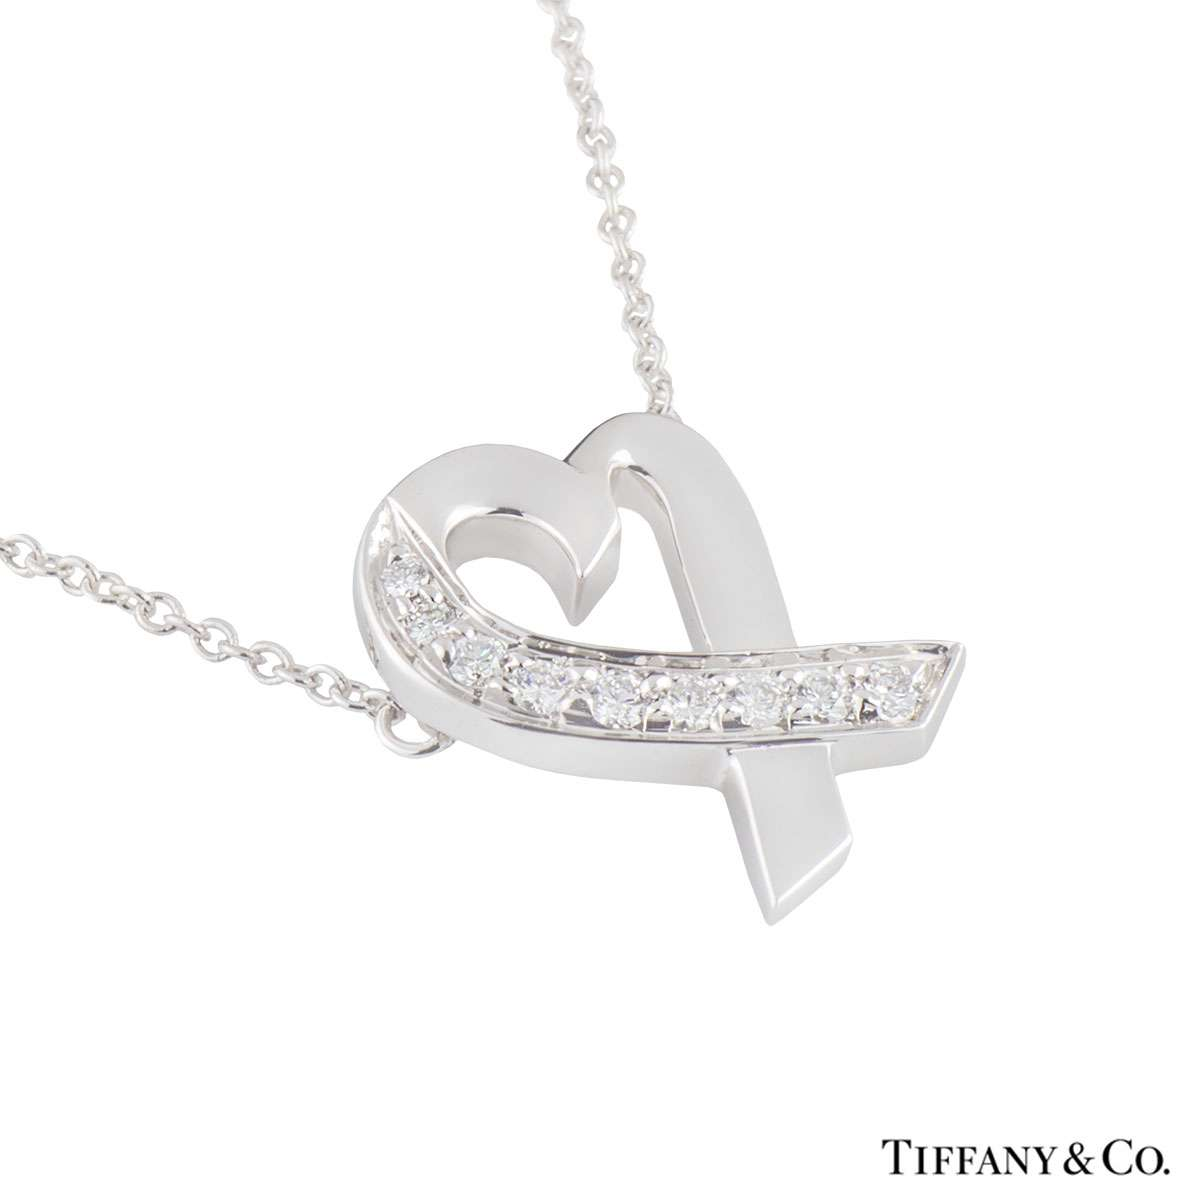 Tiffany & Co. White Gold Paloma Picasso Diamond Pendant